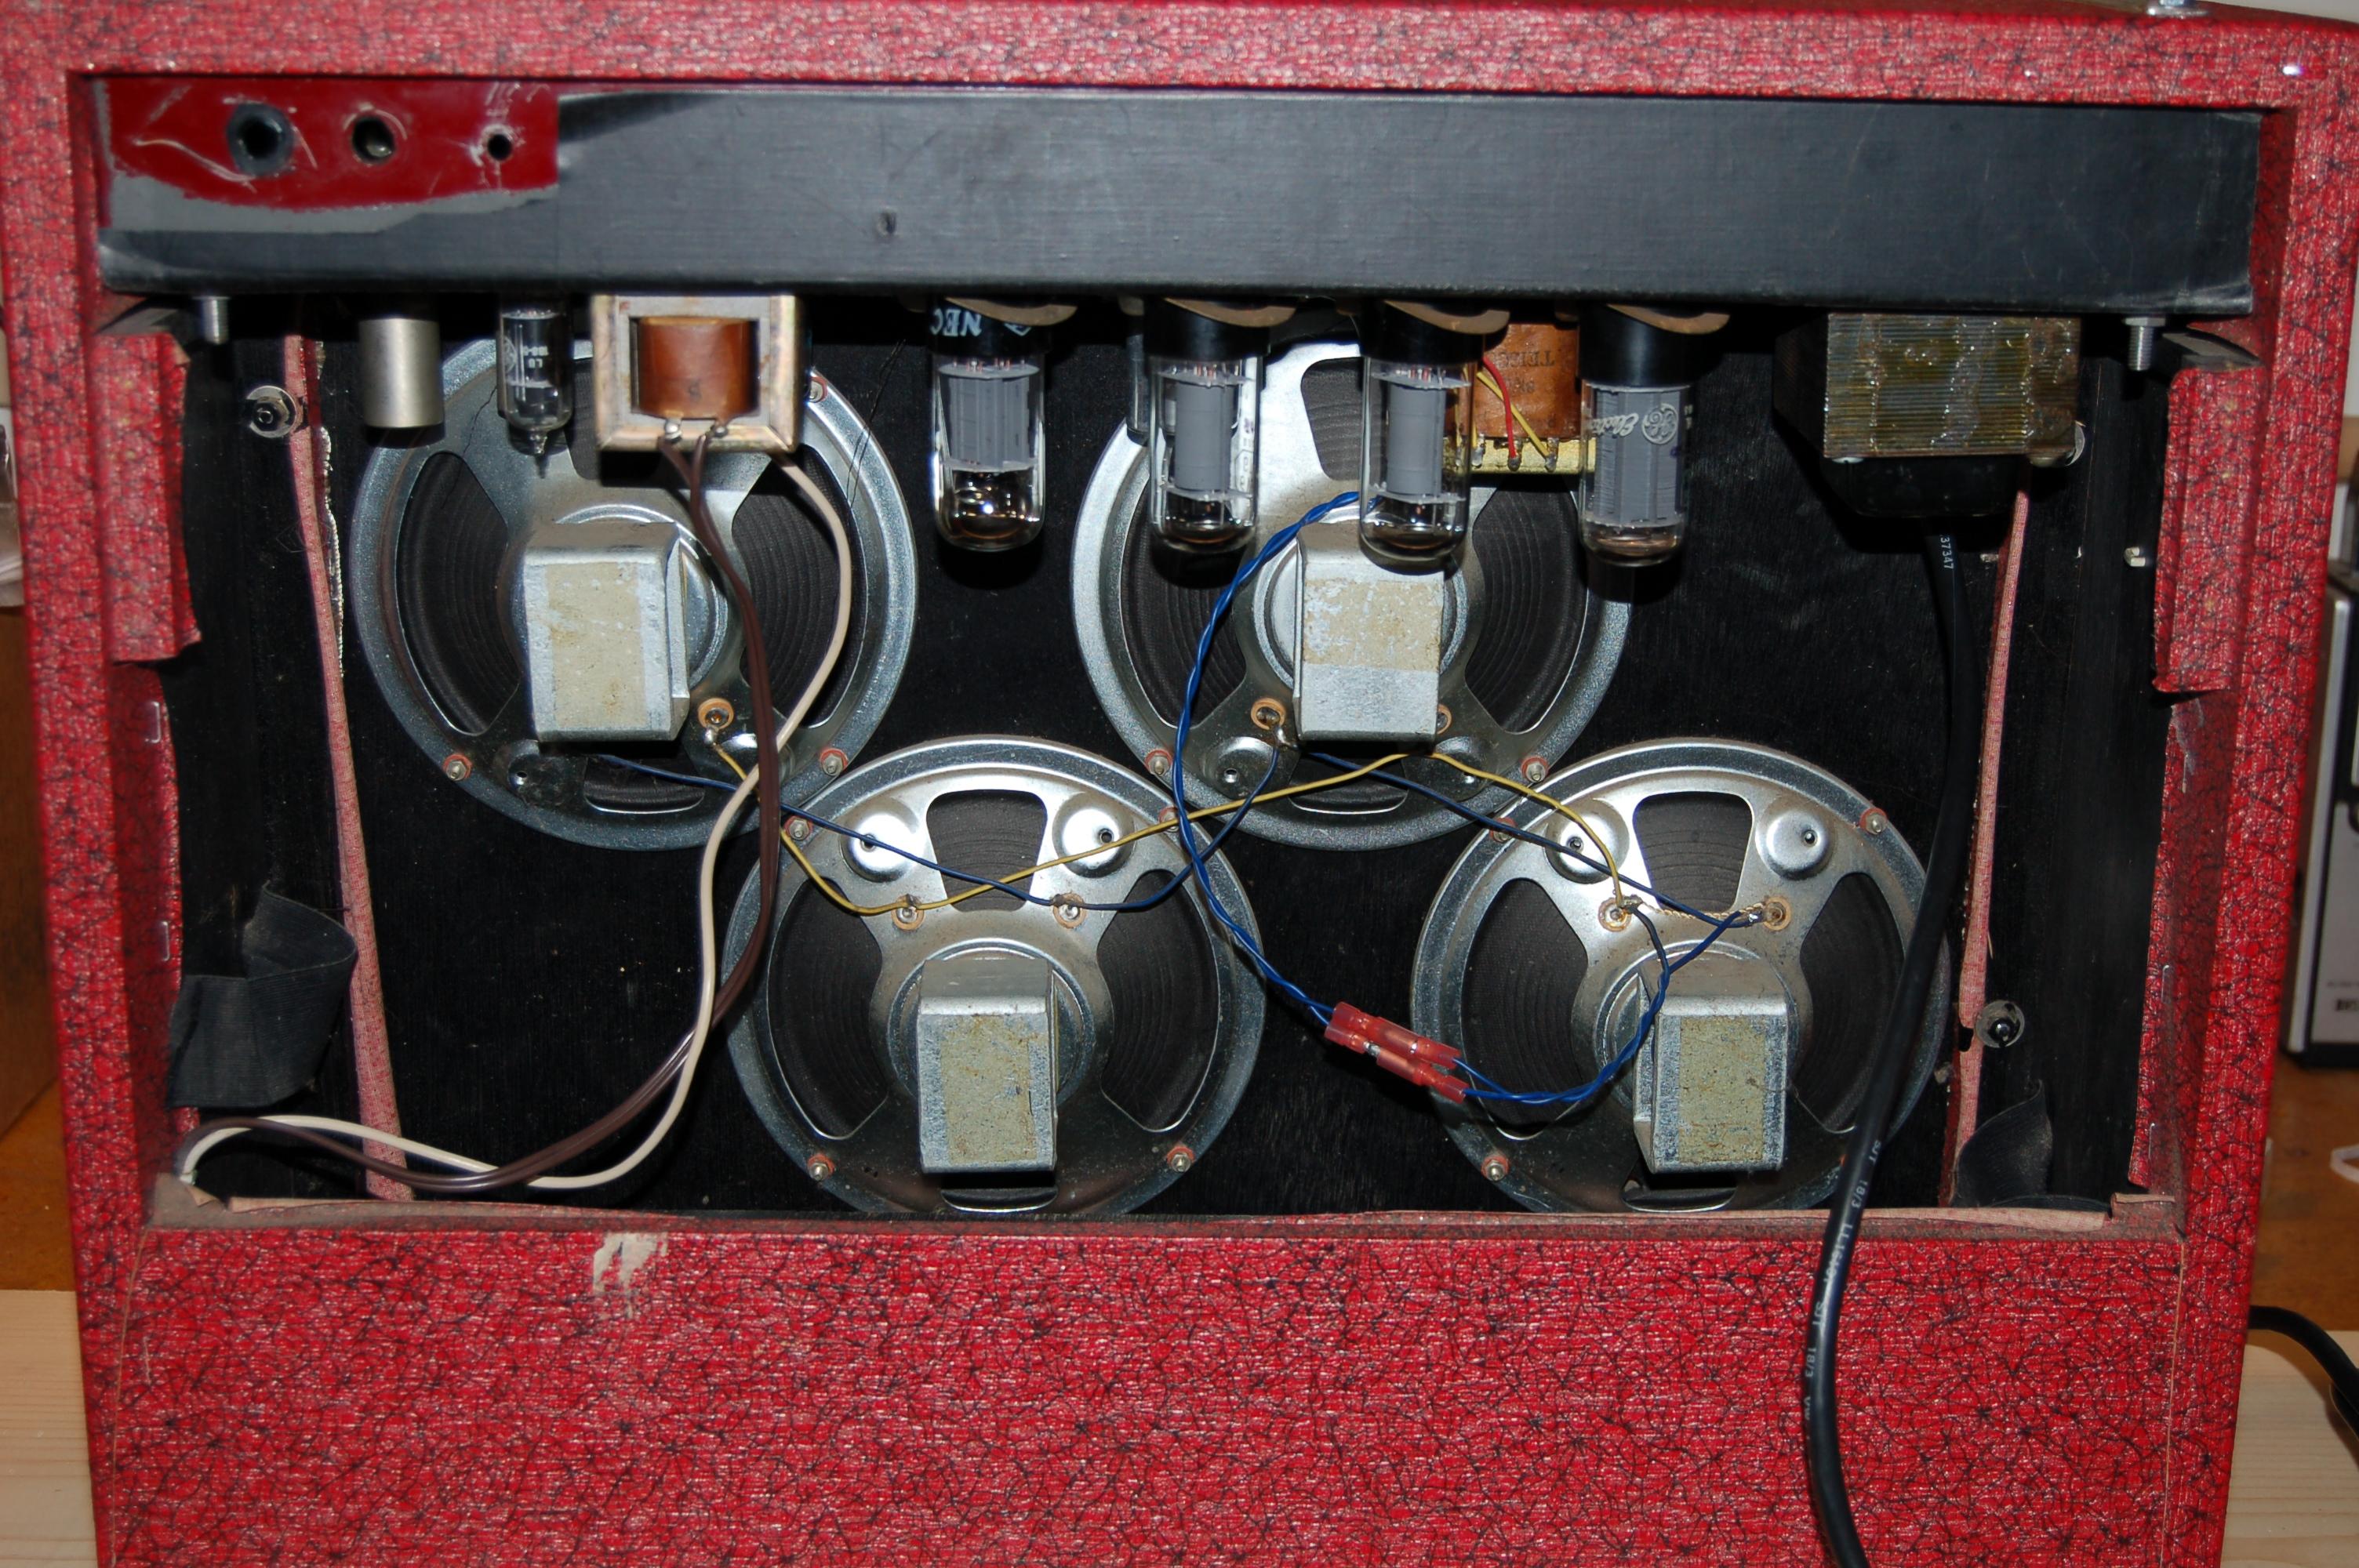 Terrific Guitar Speaker Wikipedia Wiring Cloud Mangdienstapotheekhoekschewaardnl